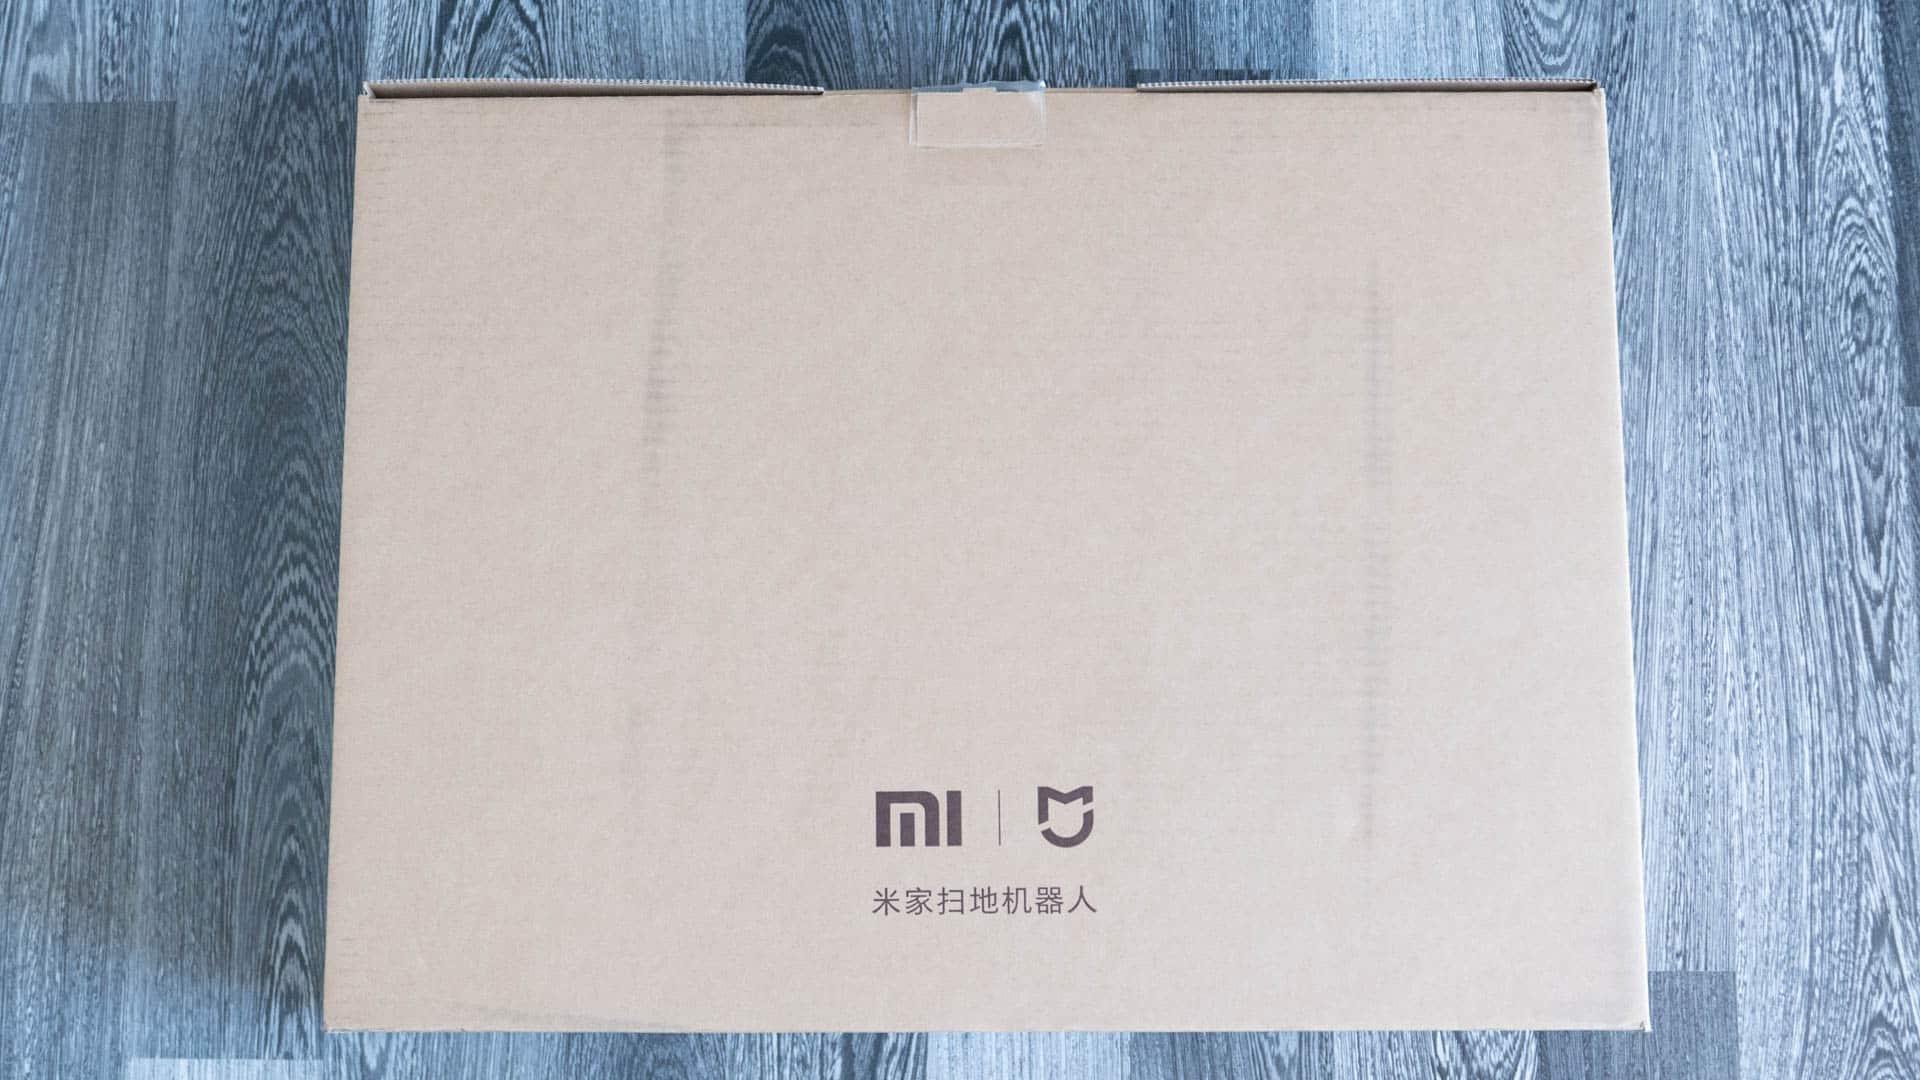 Xiaomi-Mi-Staubsauger-Roboter-im-Test-Verpackung-unten